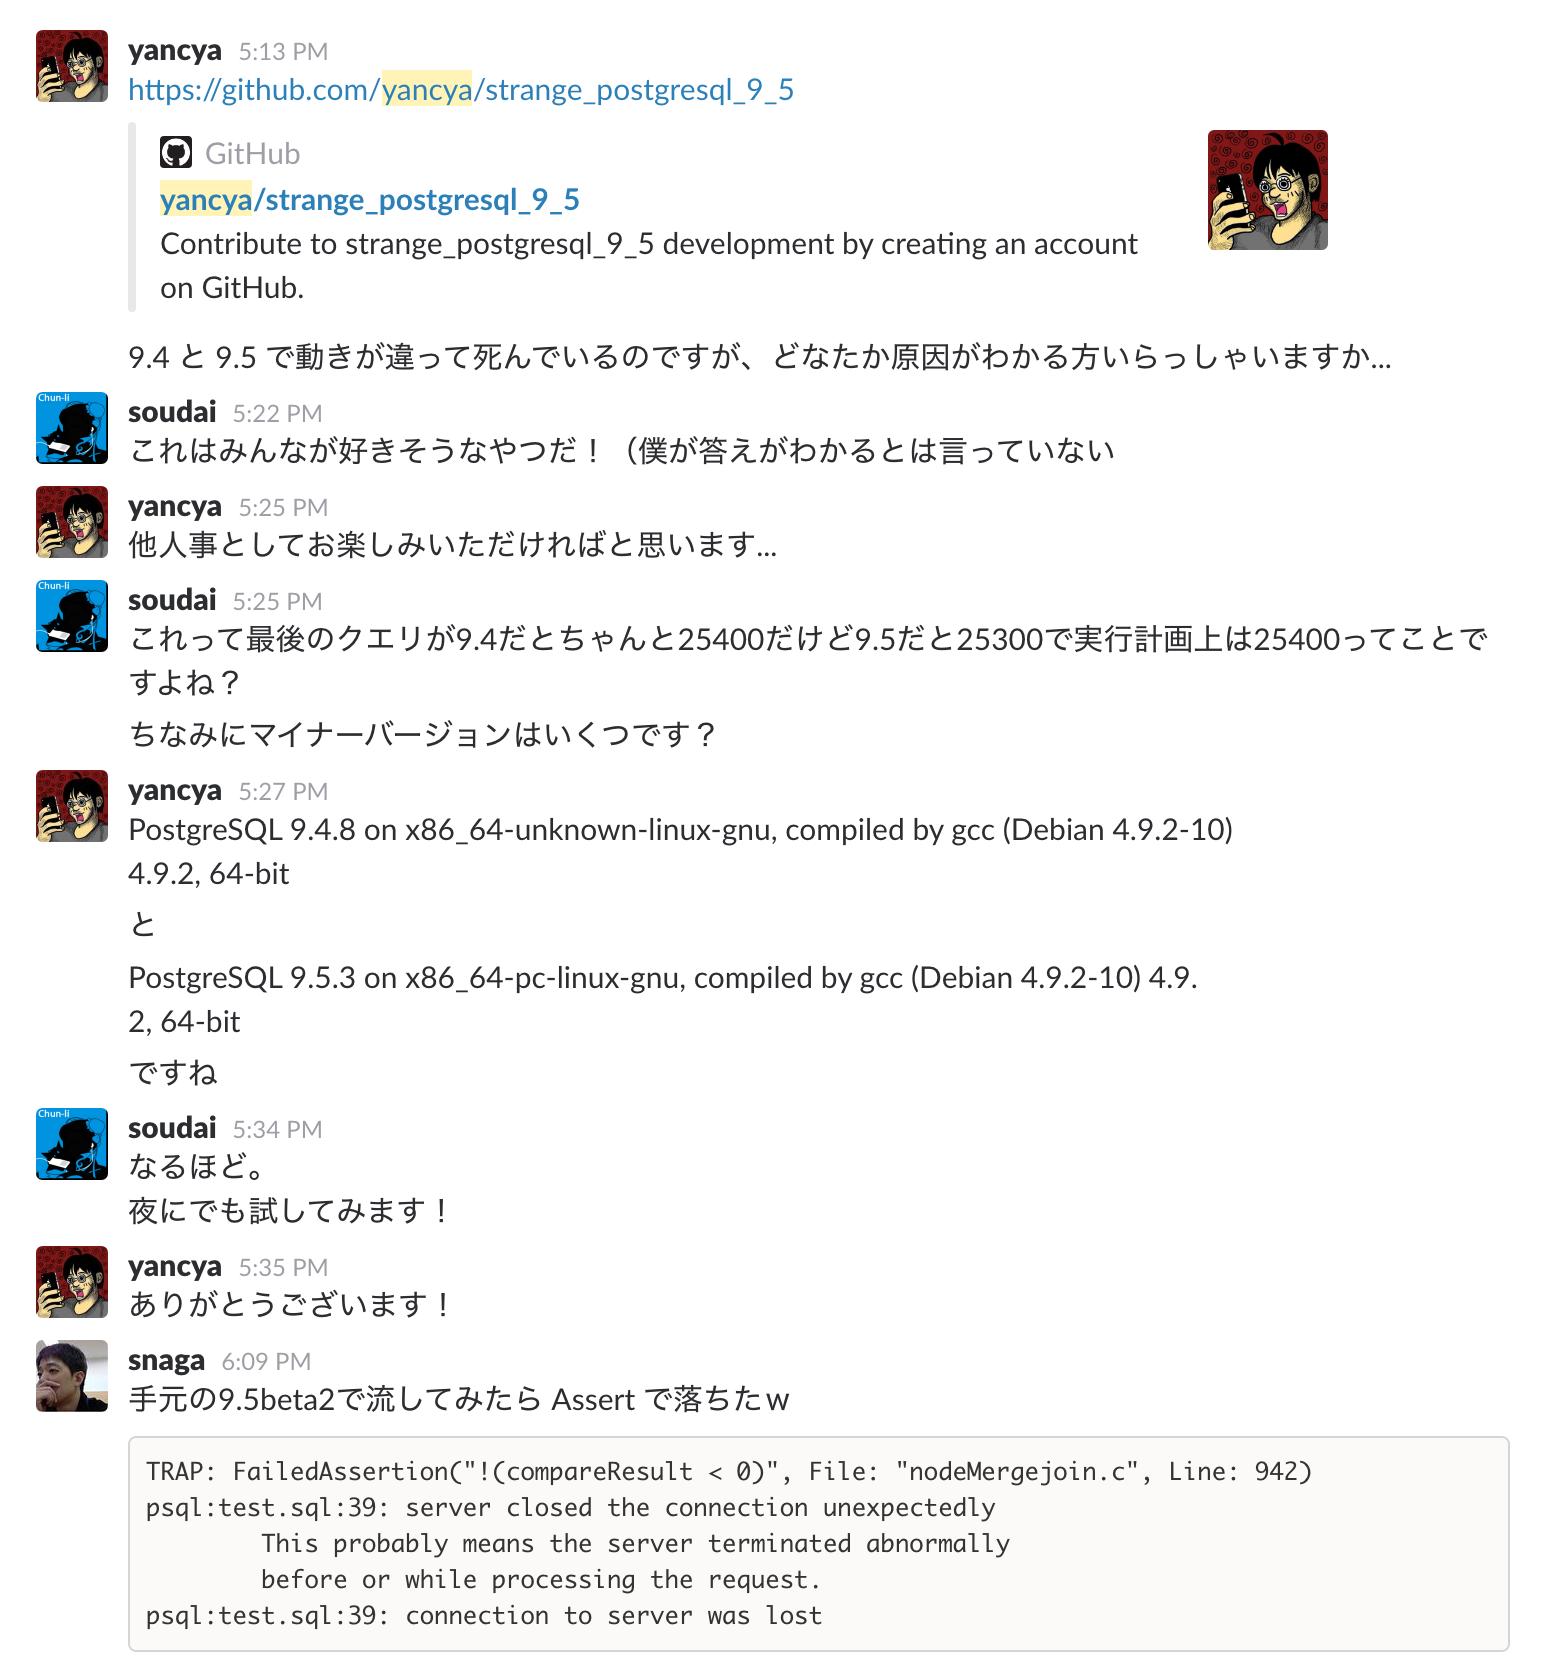 Slack_-_postgresql-jp 5.png